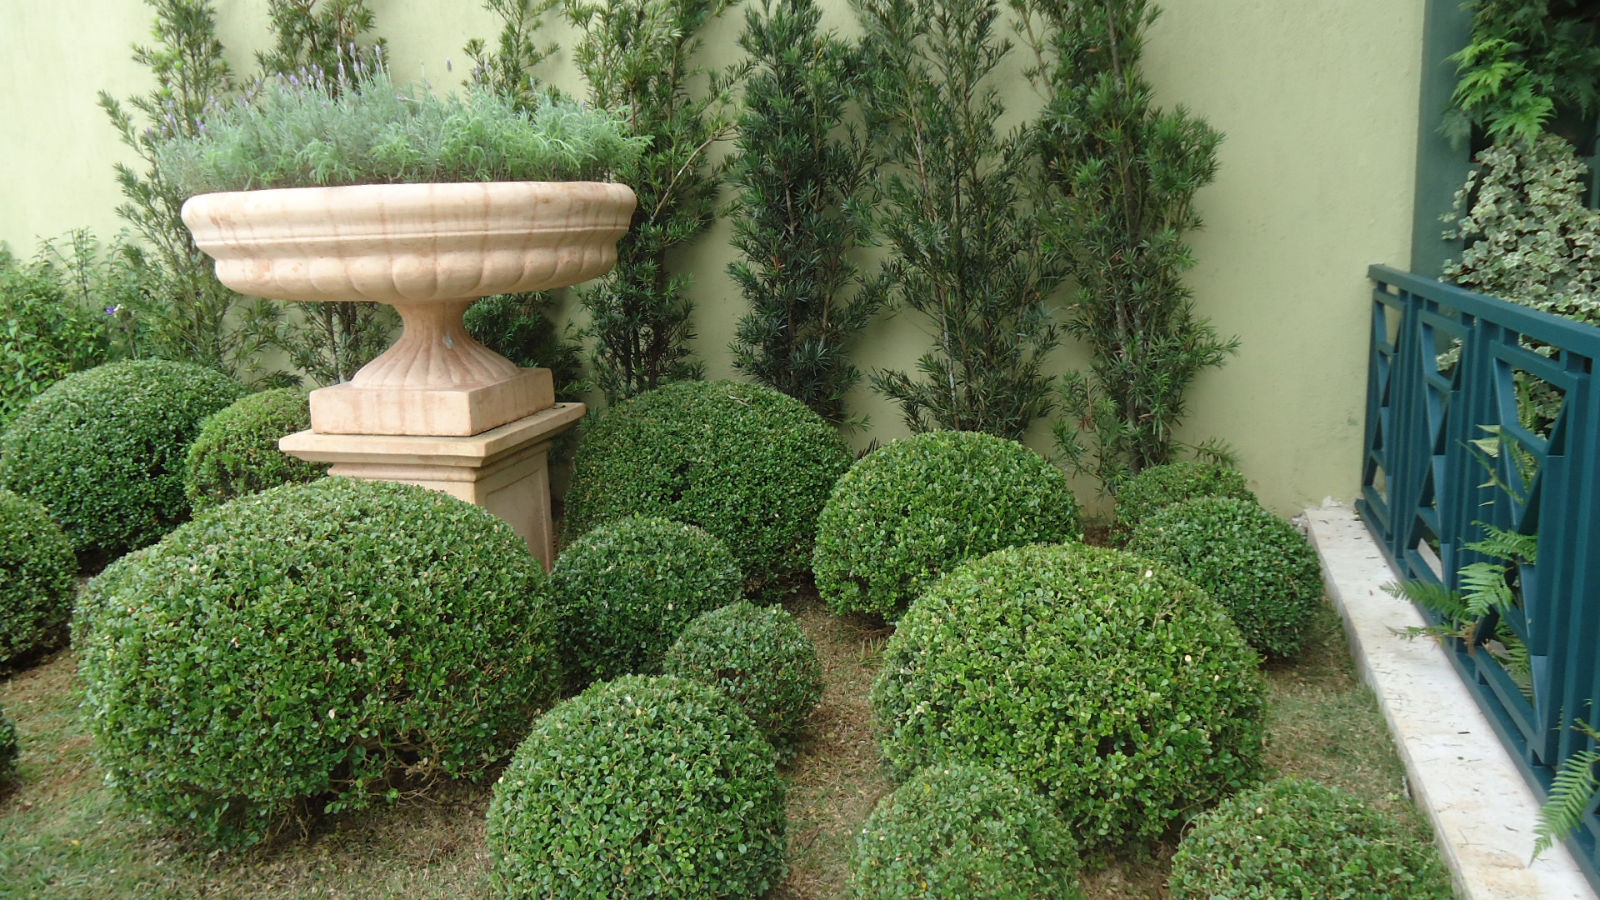 fotos jardins pequenos residenciais:Jardins Residenciais Fotos De Casas Com Jardim Pictures to pin on